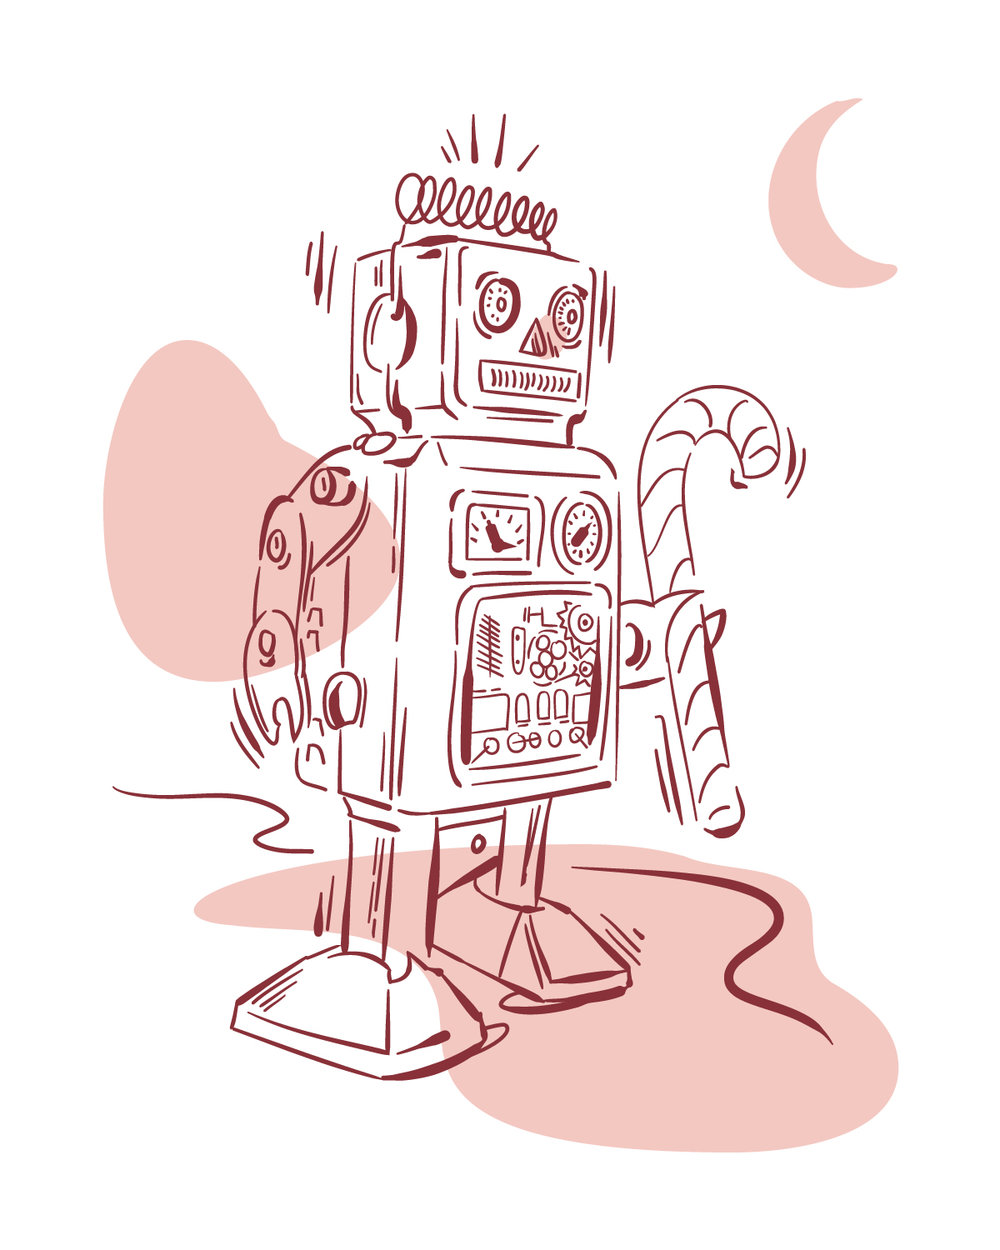 moxierobot2_KH-02.jpg